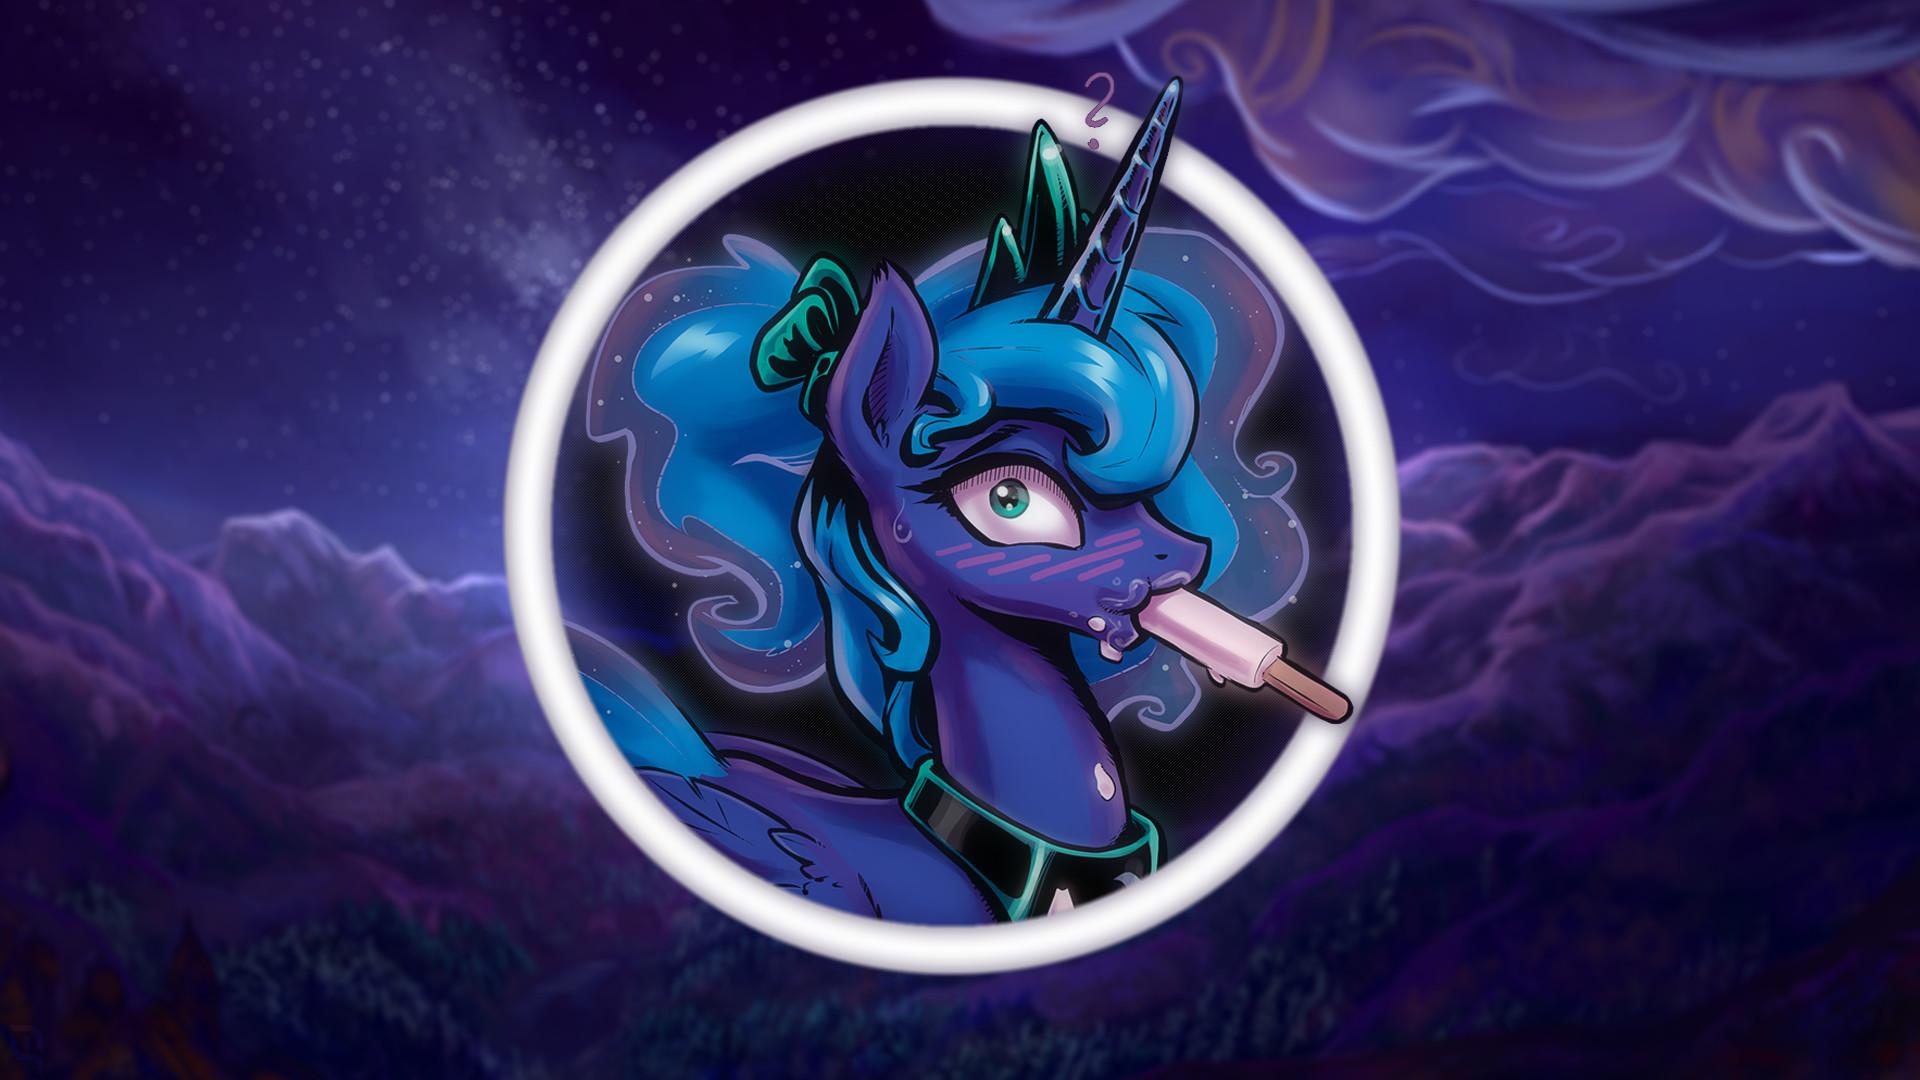 Cartoon – My Little Pony: Friendship is Magic Princess Luna My Little Pony  Wallpaper